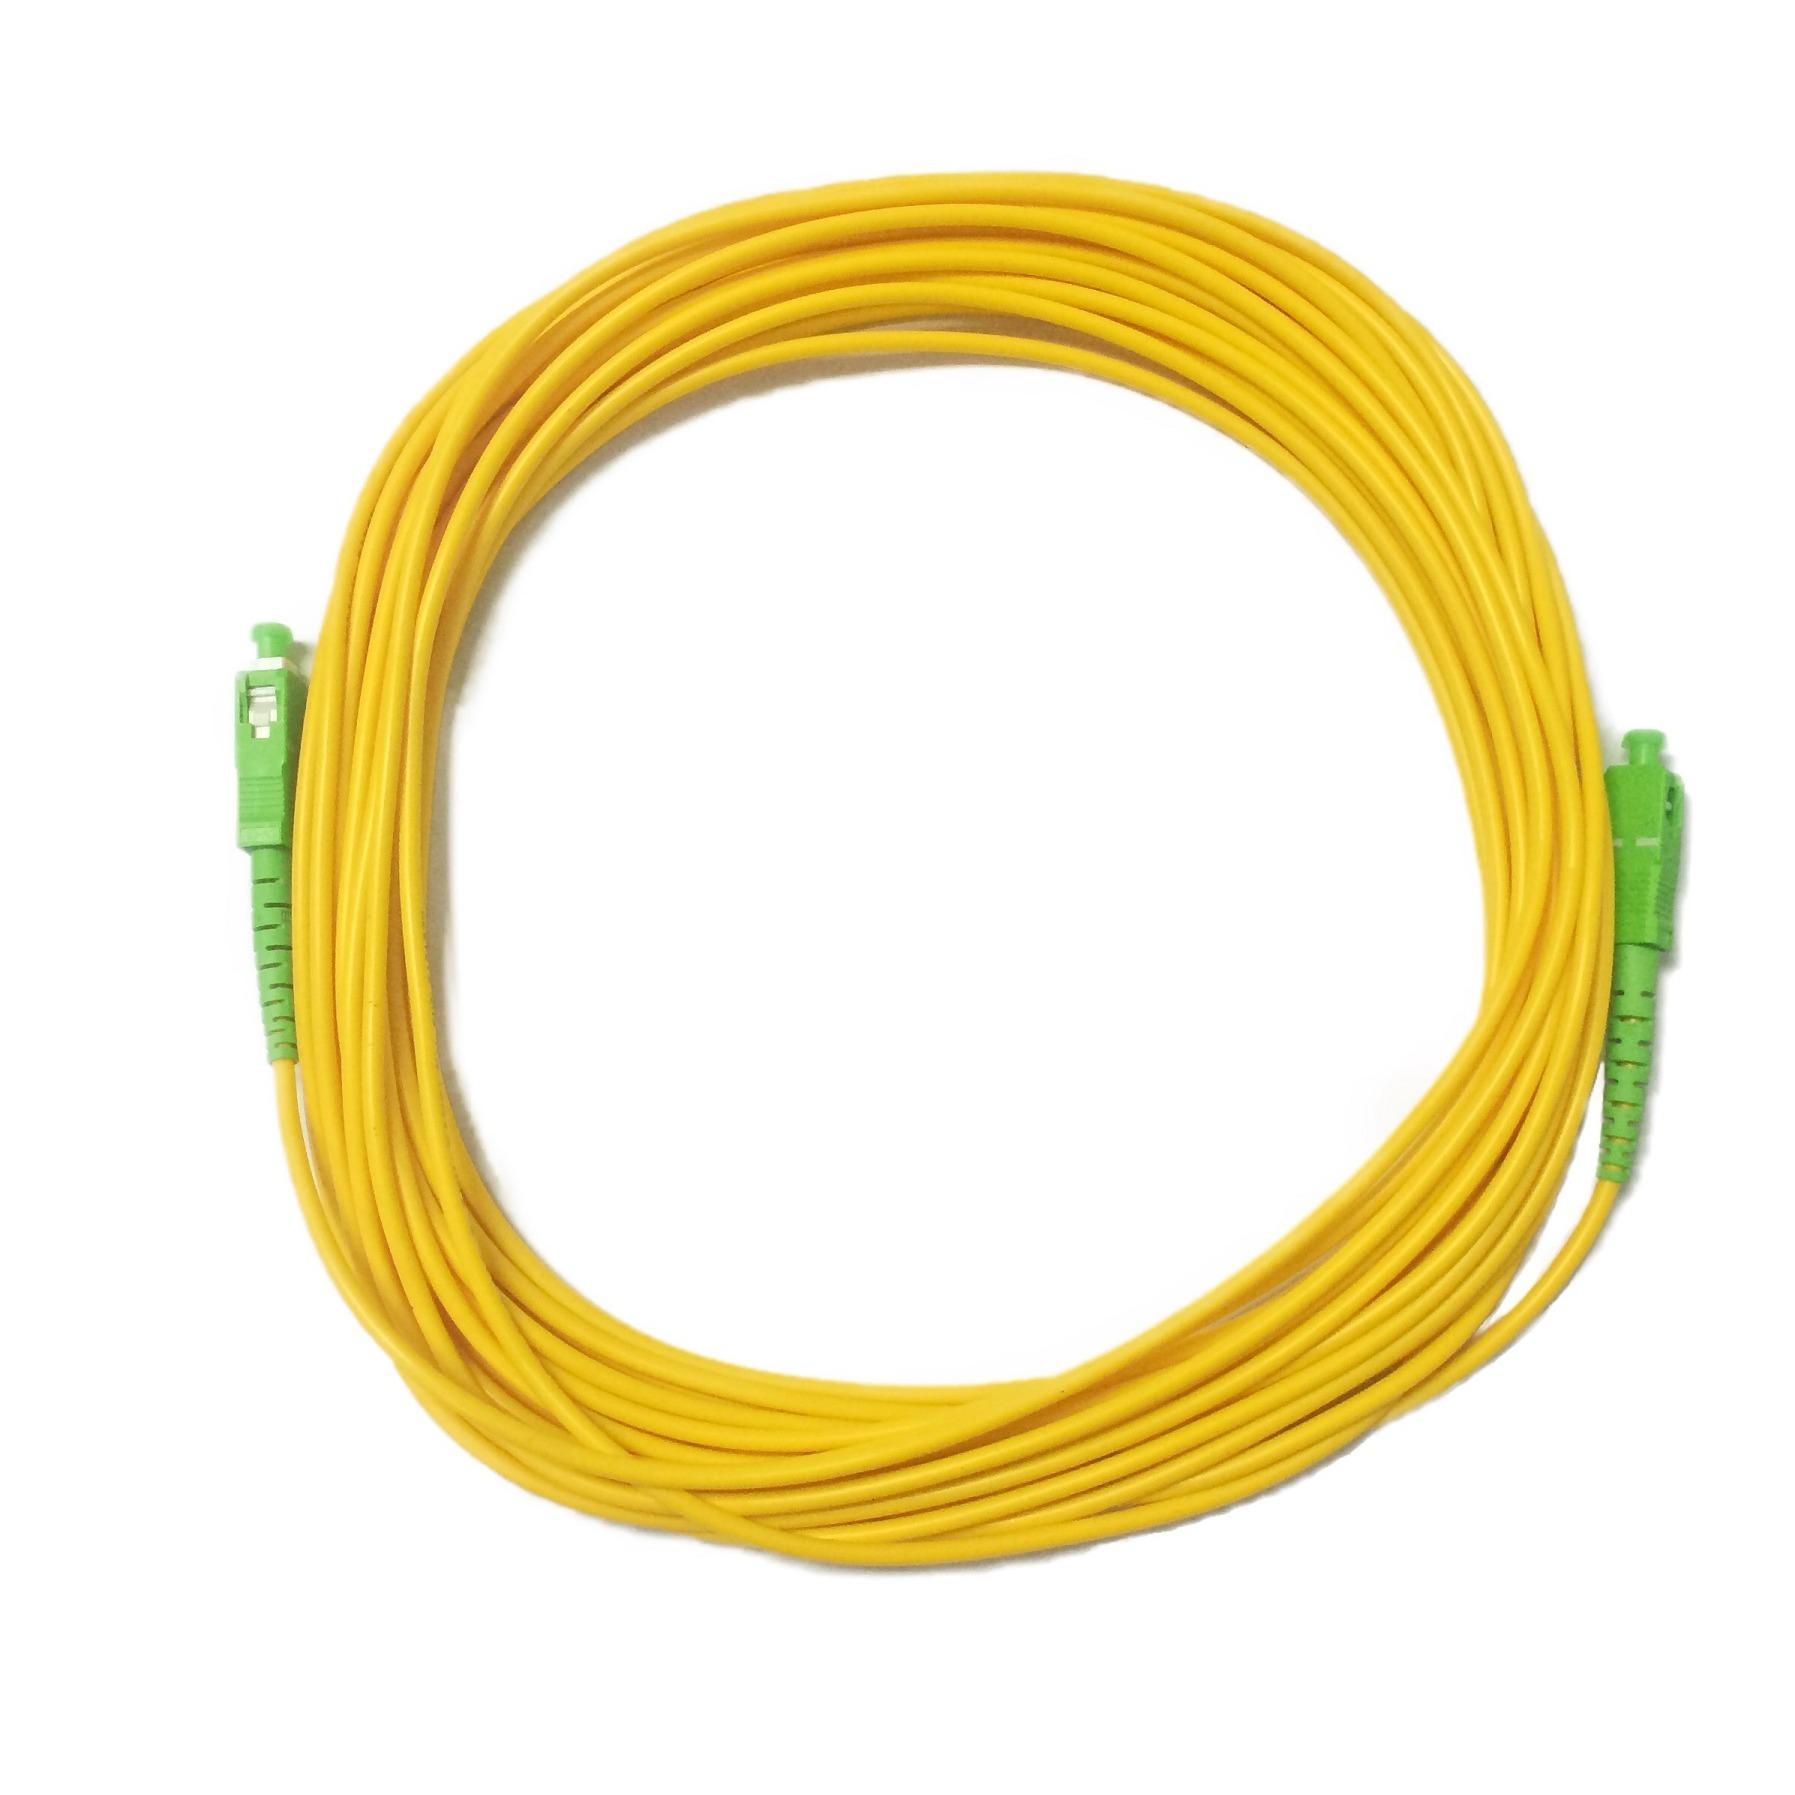 Buy Latest Ethernet Cables Adapters Kabel Lan Belden 25 M Utp Rj45 Cat5e Original Usa Meter Fibre Optics Cable Sc Apc Singlemode Simplex 10 Metre